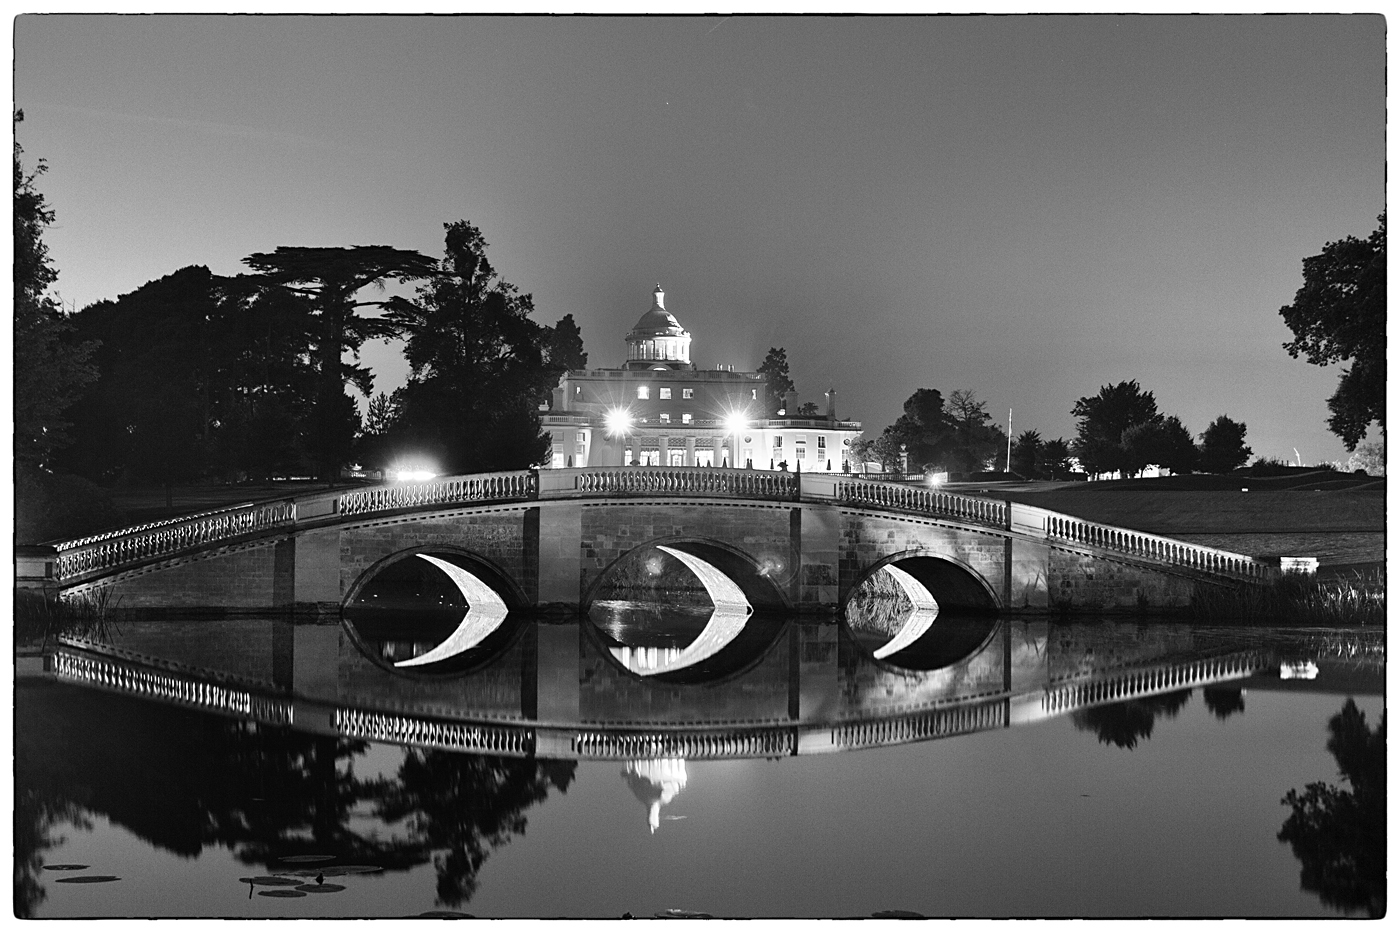 STOKE PARK AT NIGHT by Peter Morrish.jpg